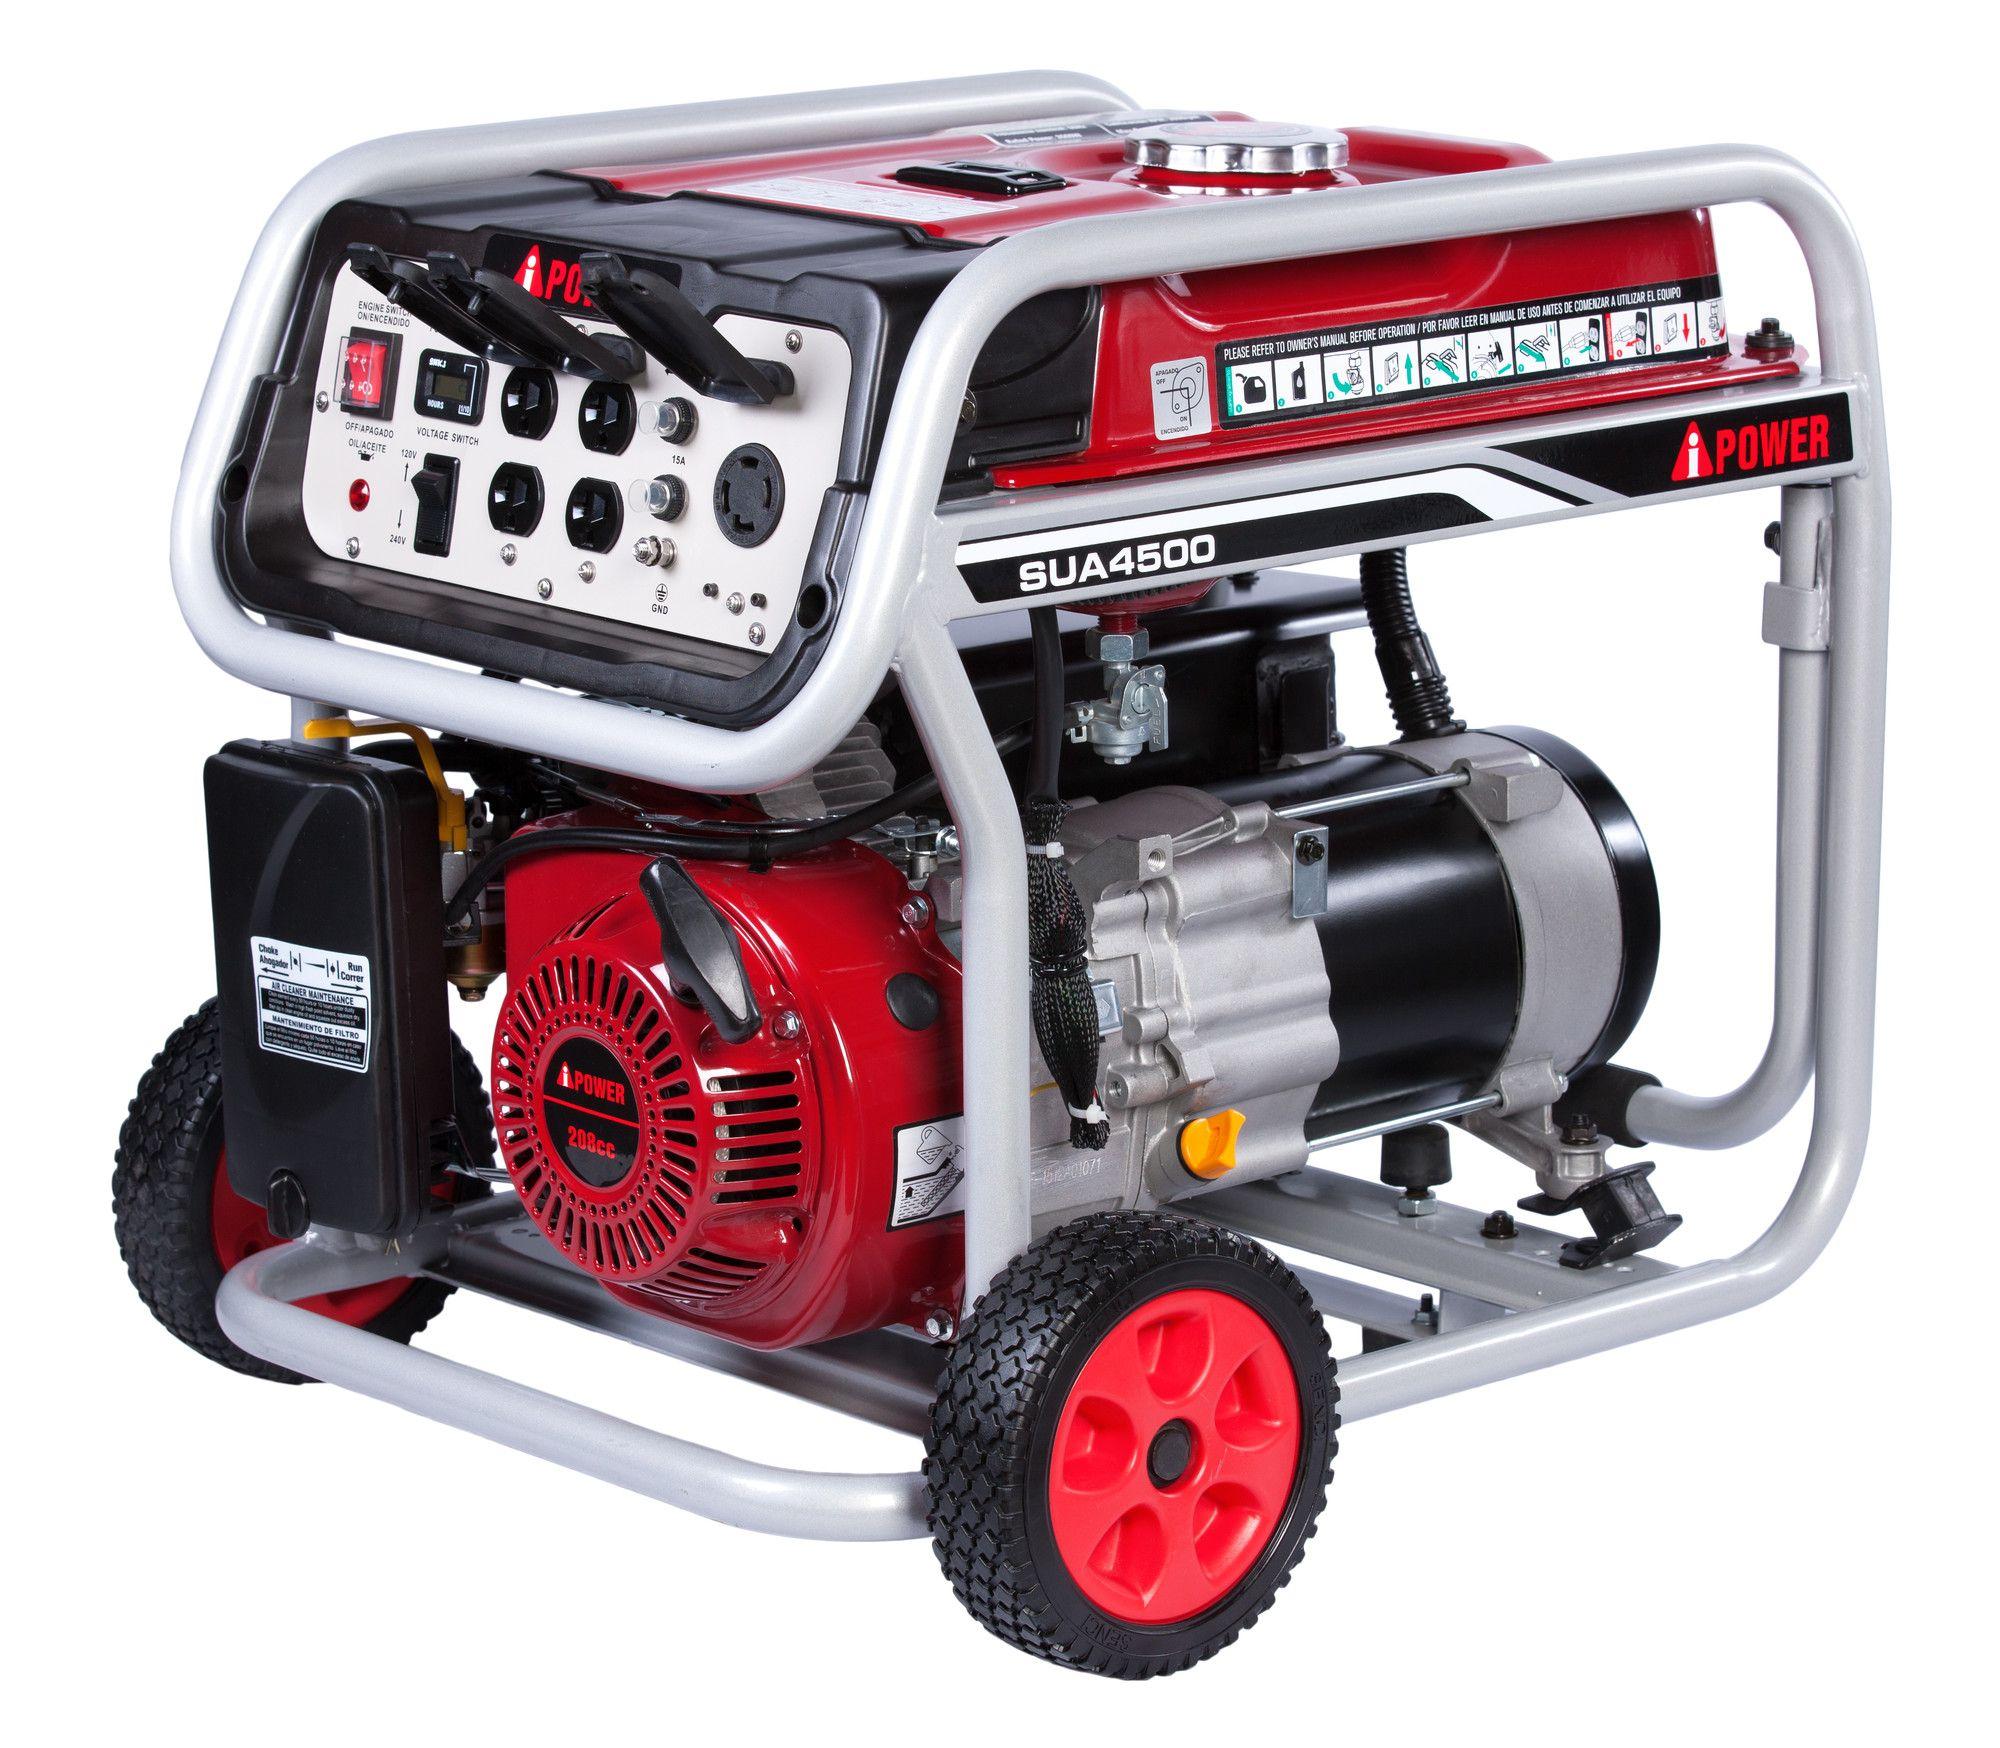 4500 Watt Portable Gasoline Generator Portable generator